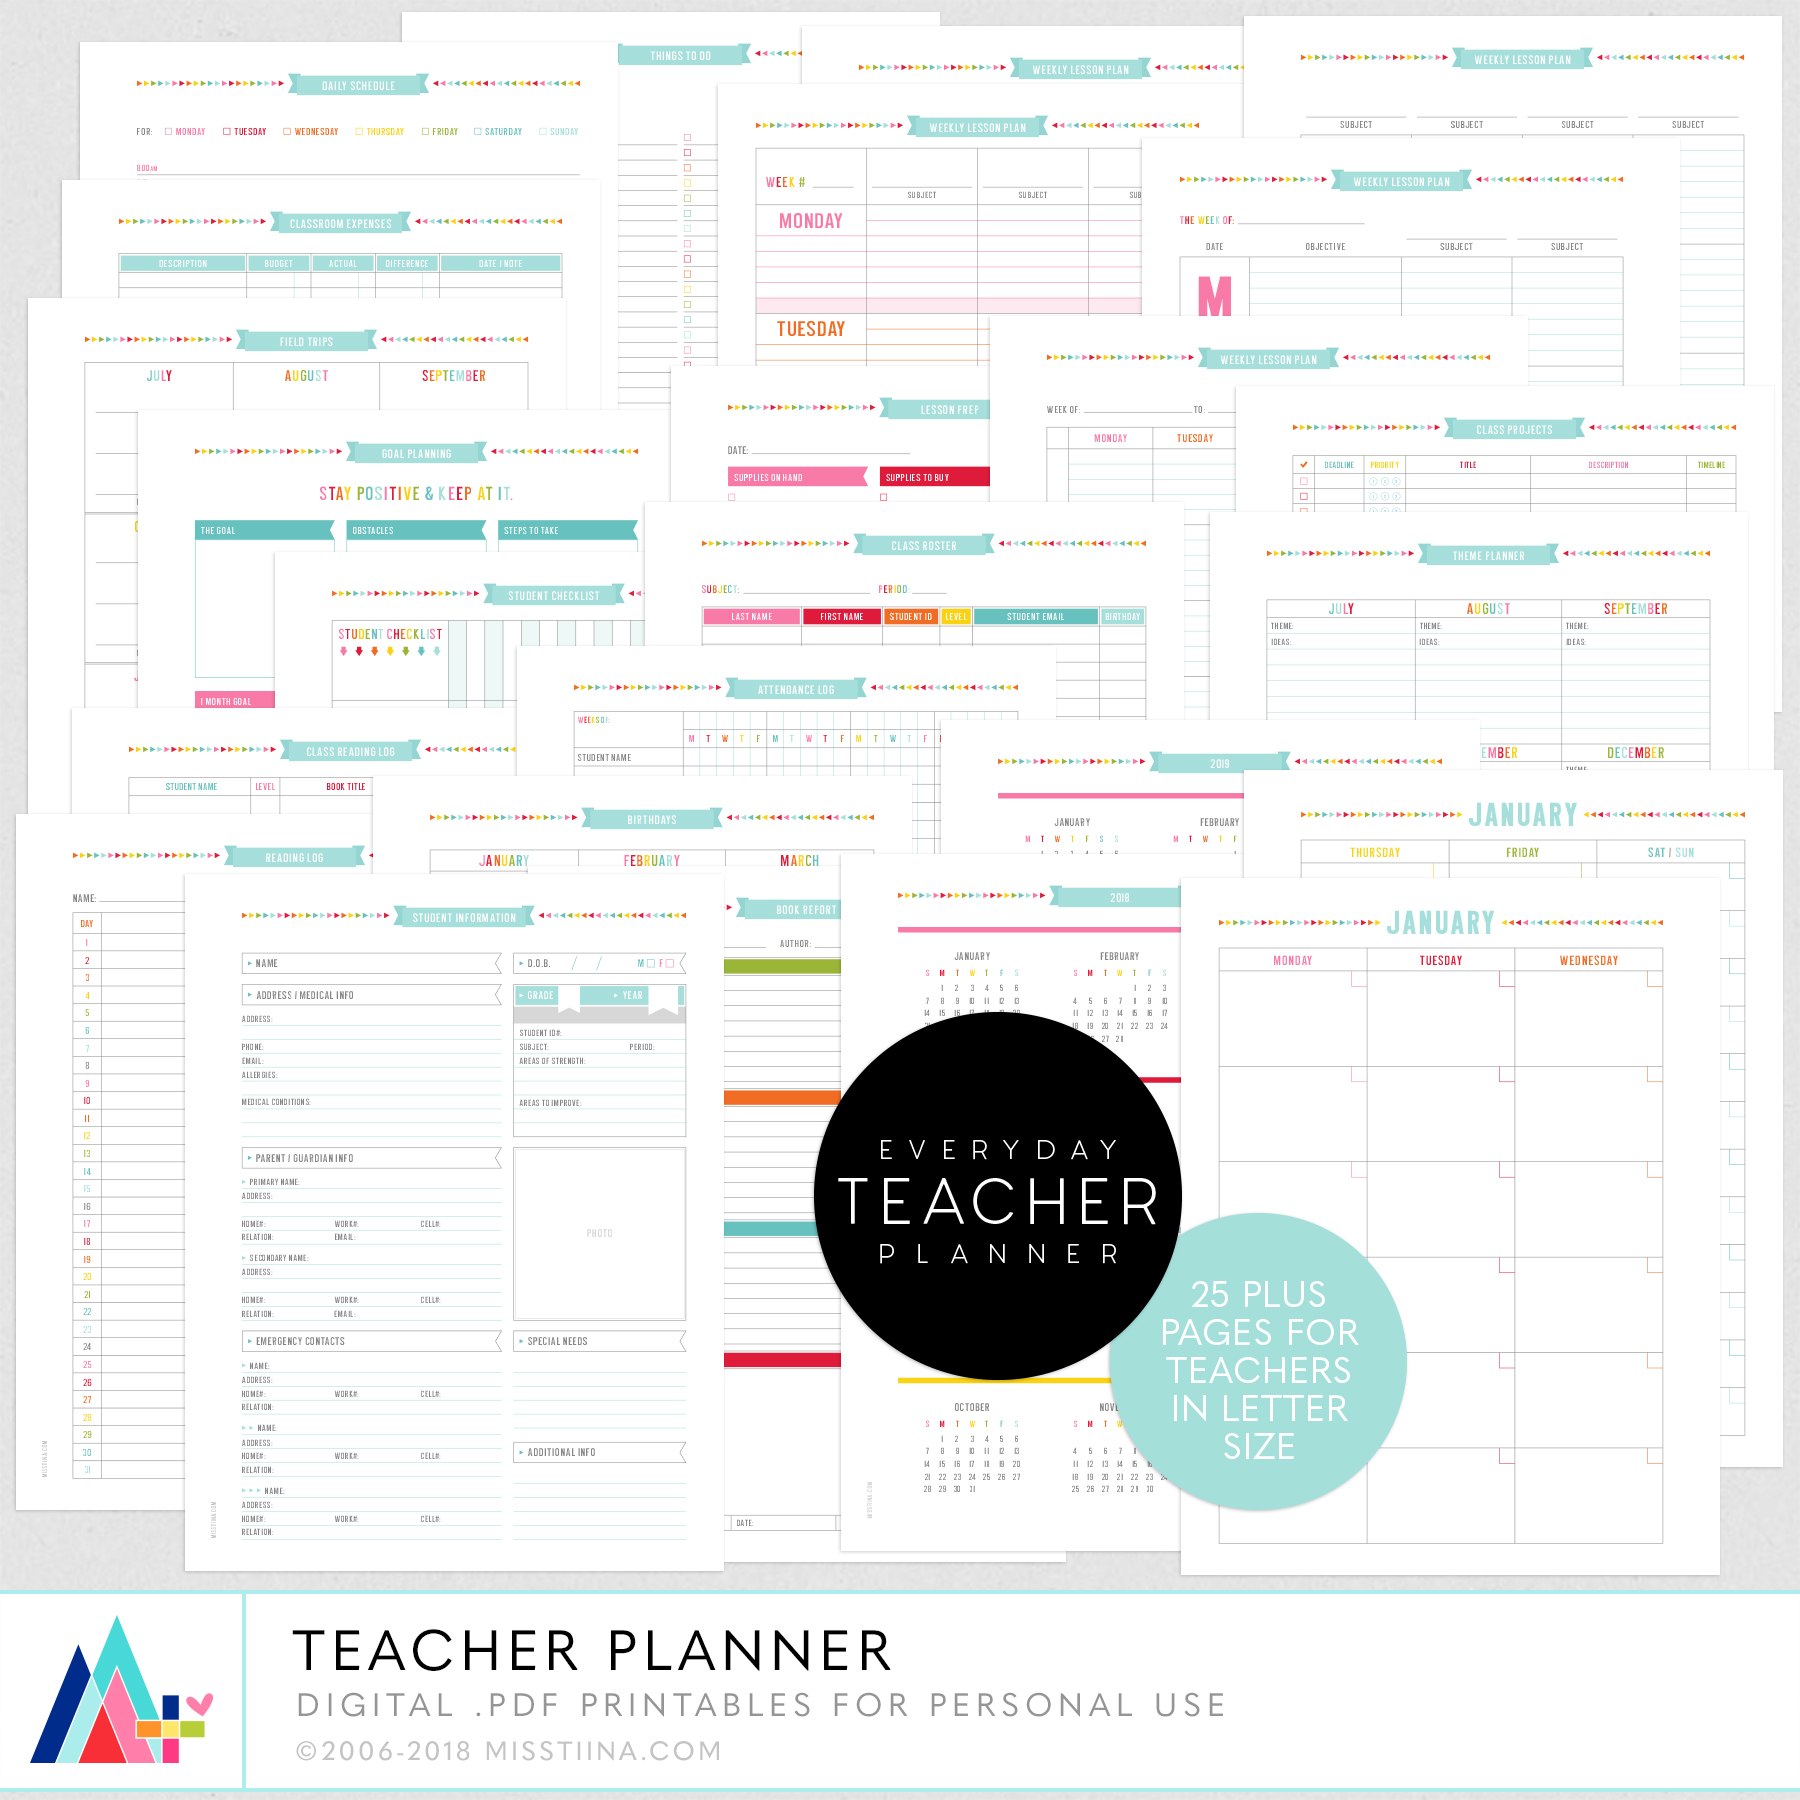 teacher planner 3 new printable planner freebies misstiina com